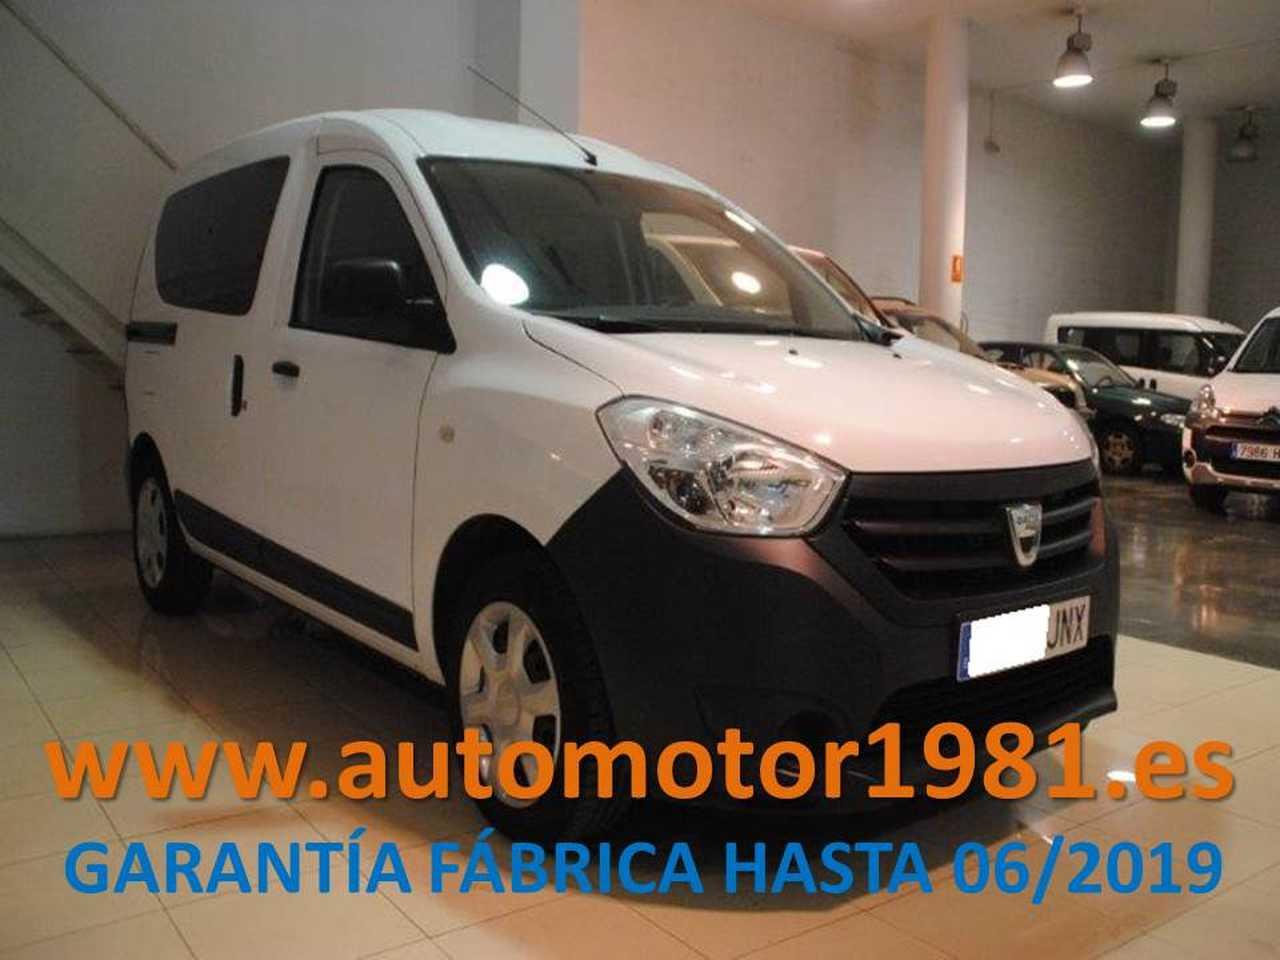 Dacia Dokker 1.5dCi Ambiance N1 90 - GARANTIA FABRICA 06/2019  - Foto 1